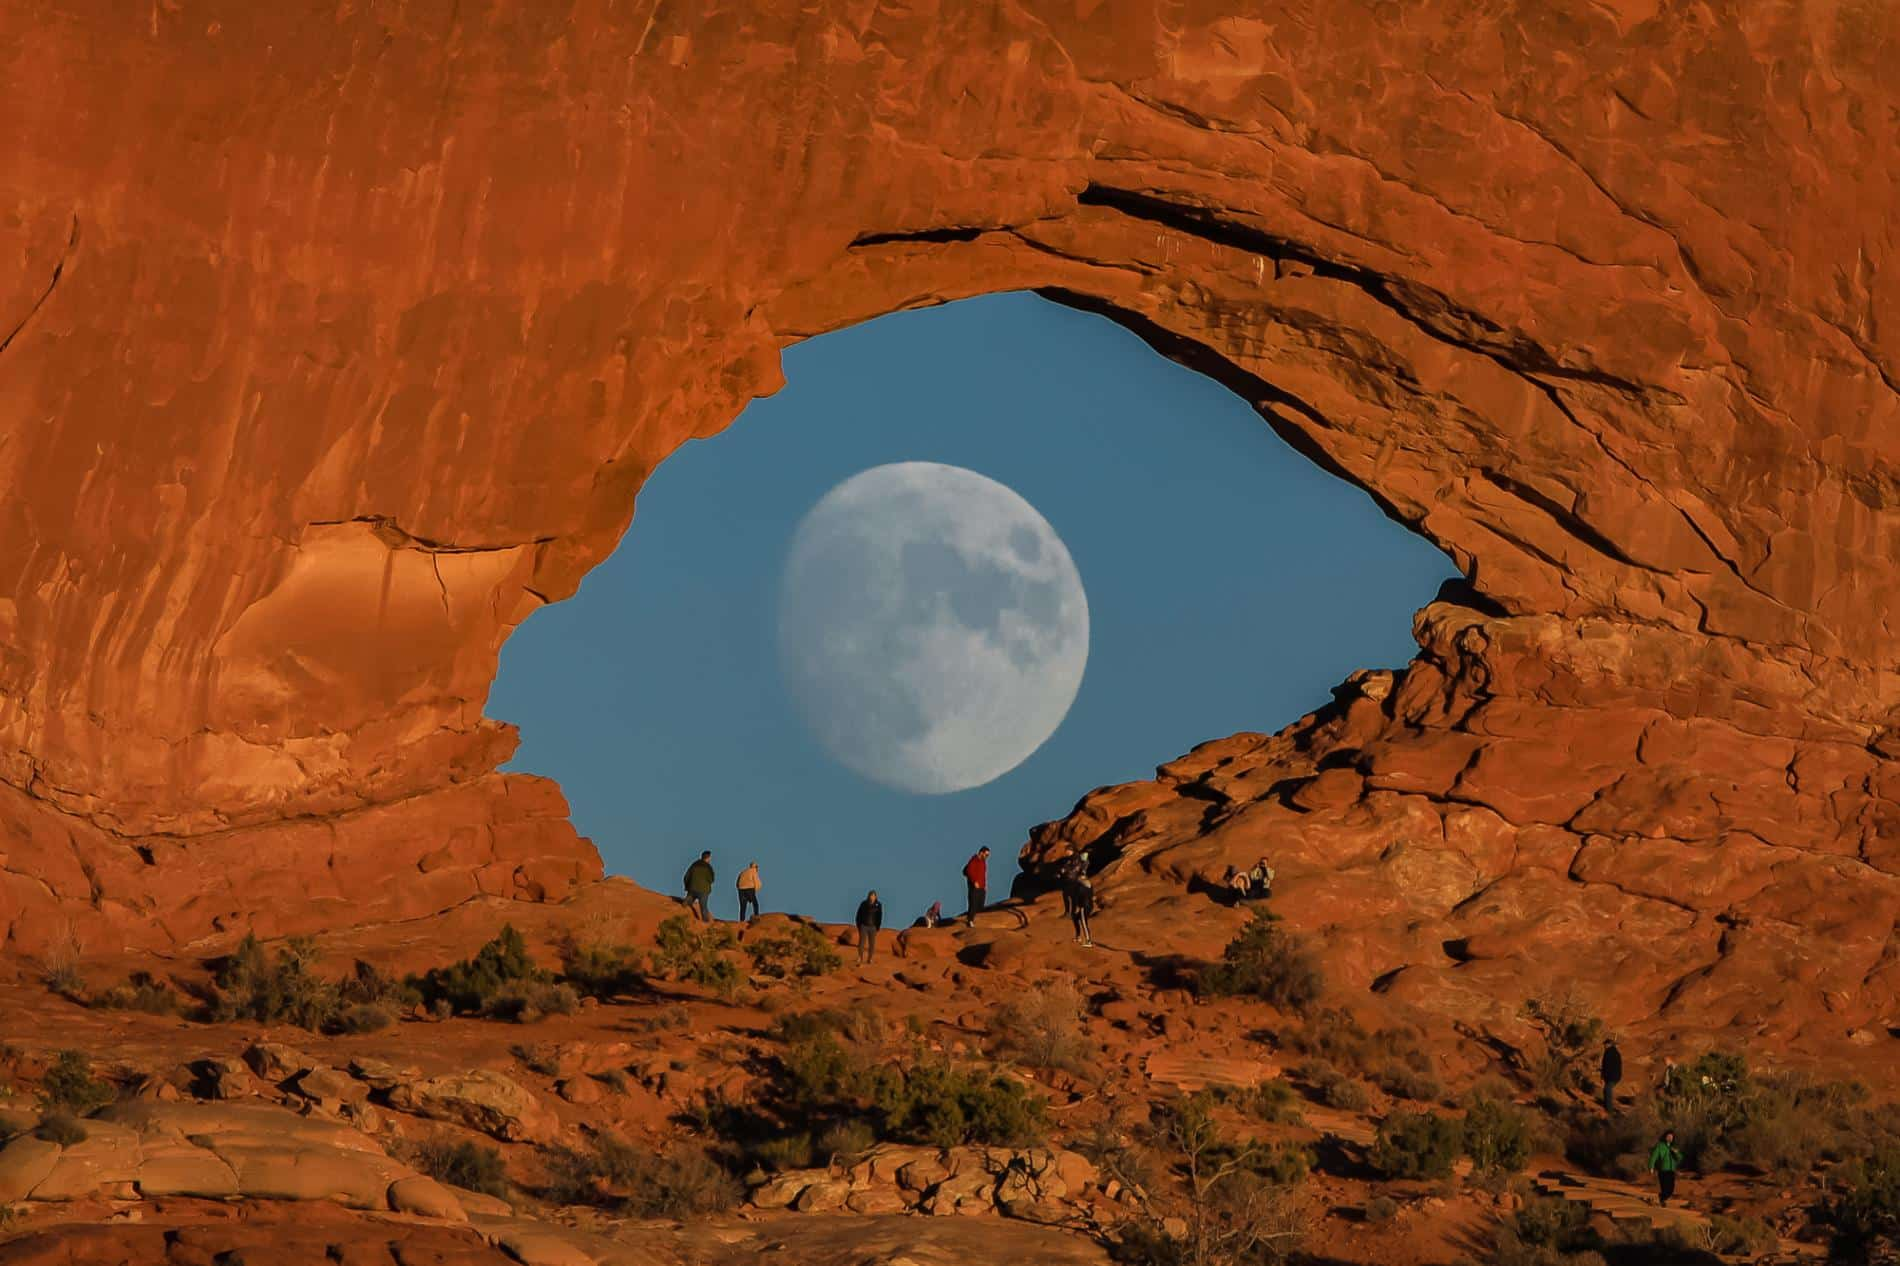 cooley luna de ojo